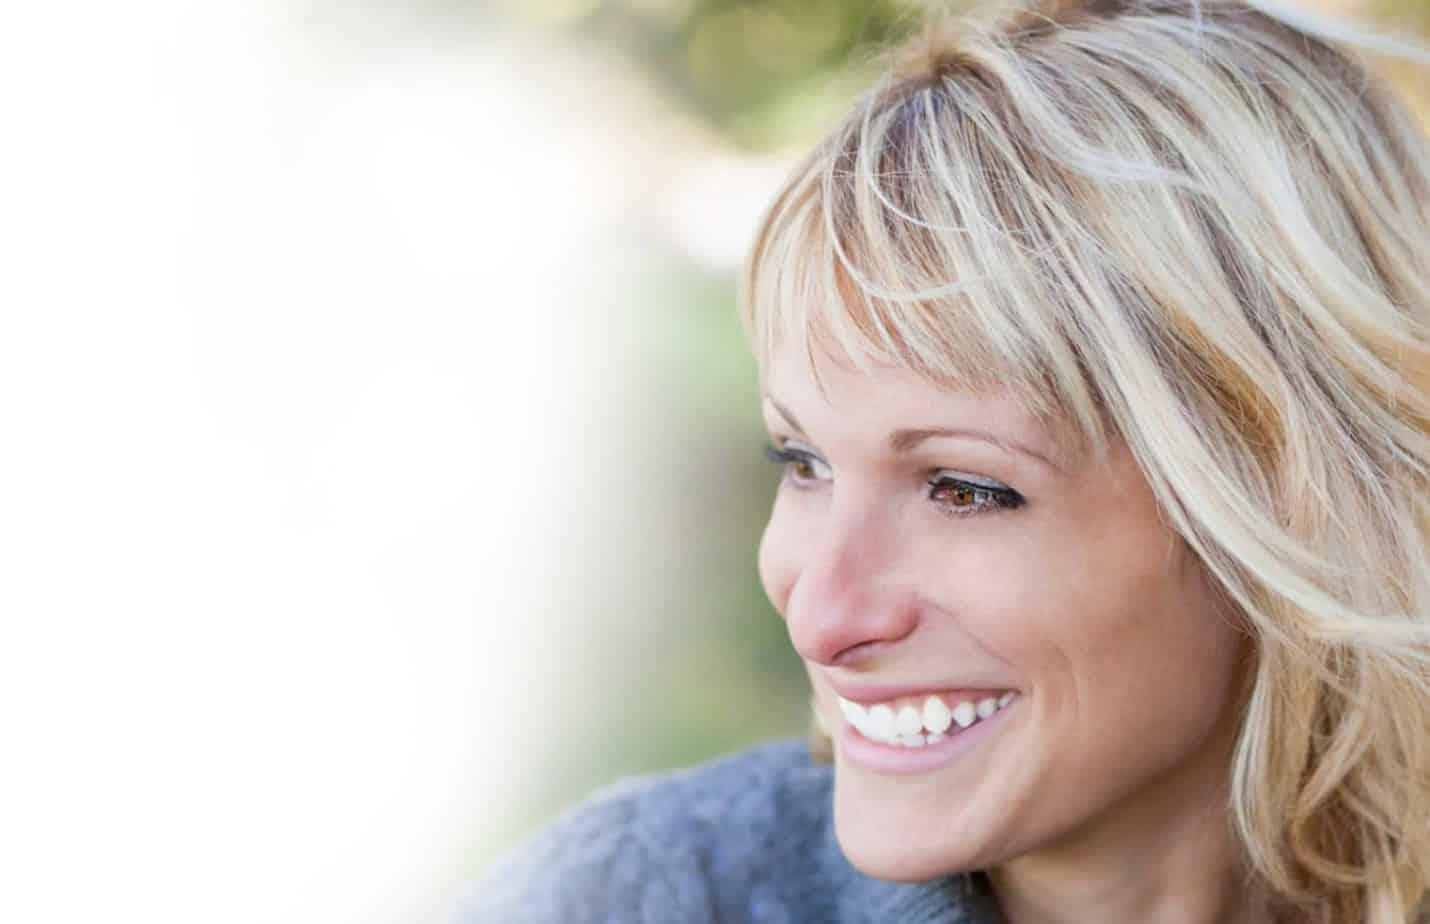 Implantología estética - Clínica Dental en Valencia Benimaclet ARTDENTA